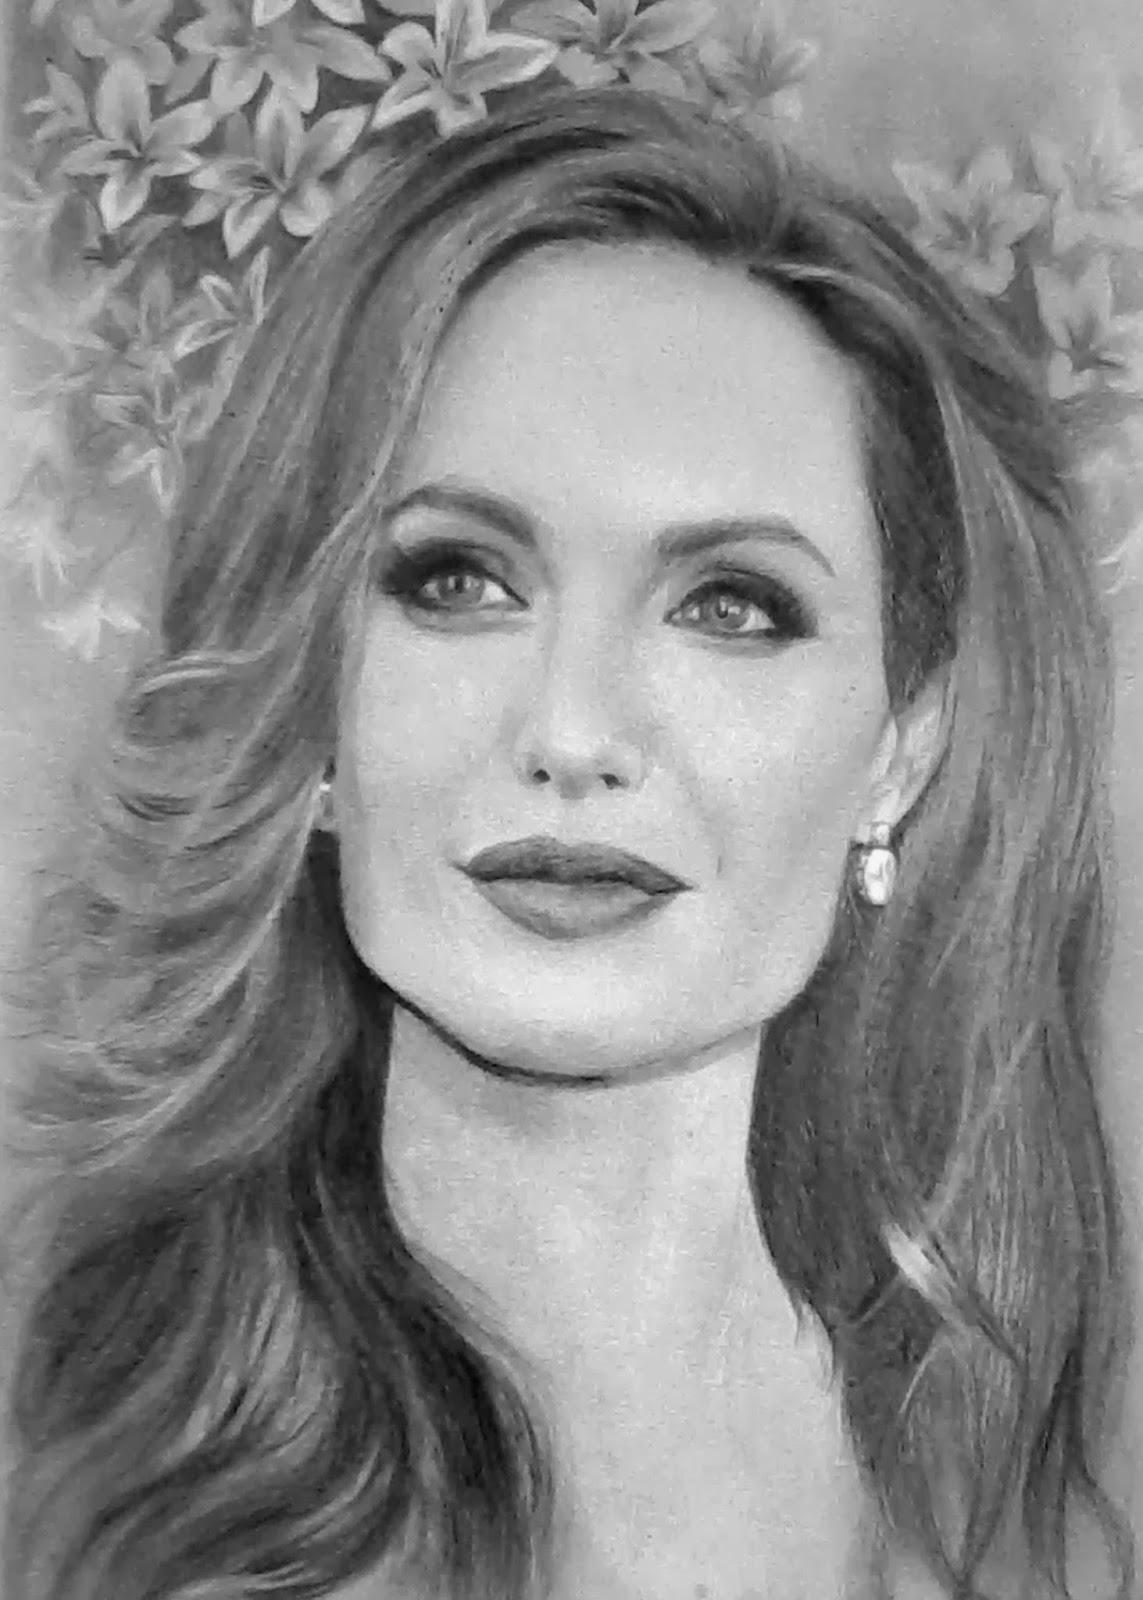 Vida de Artista: Angelina Jolie